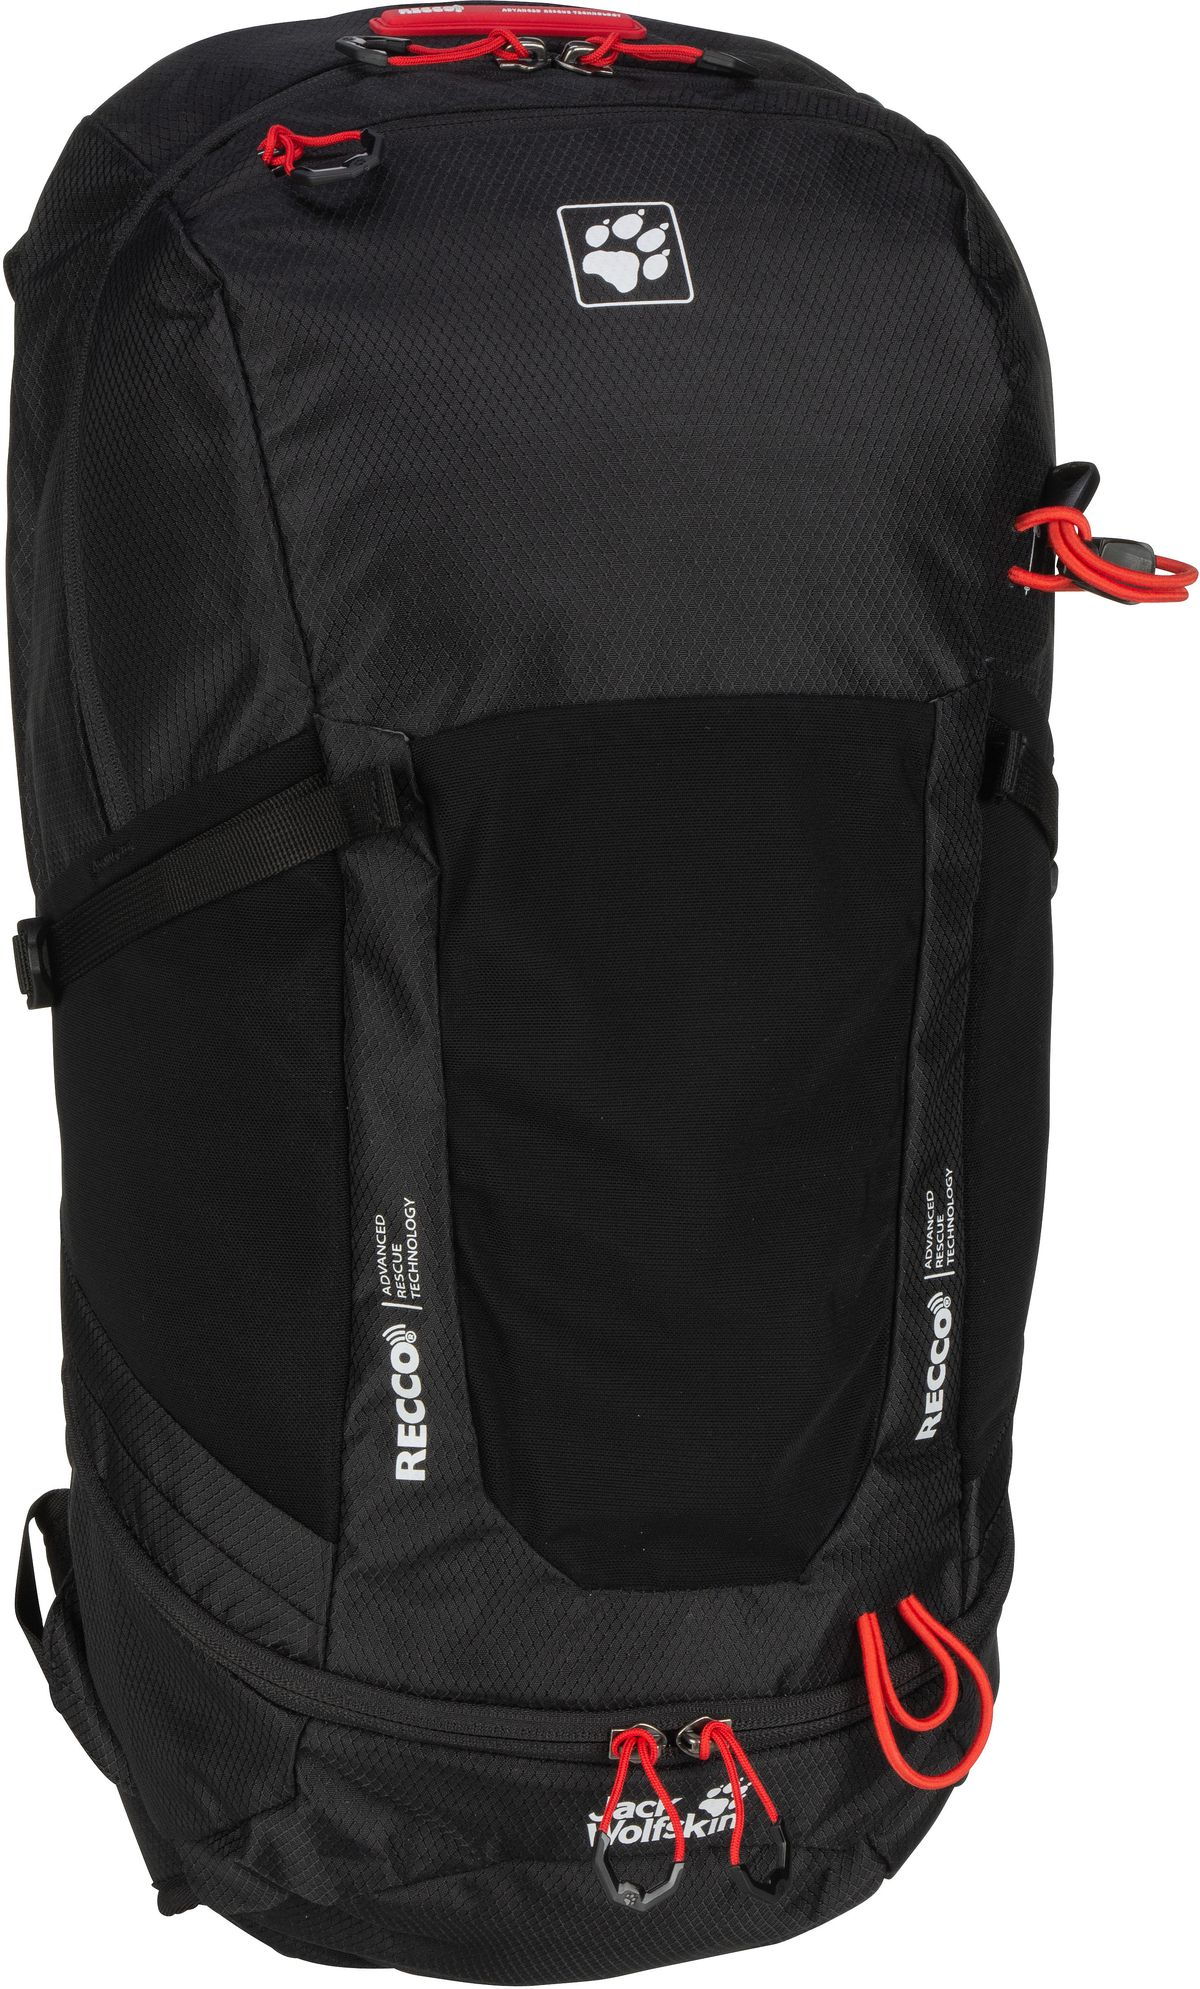 Wanderrucksack Kingston 22 Pack Recco Black (22 Liter)